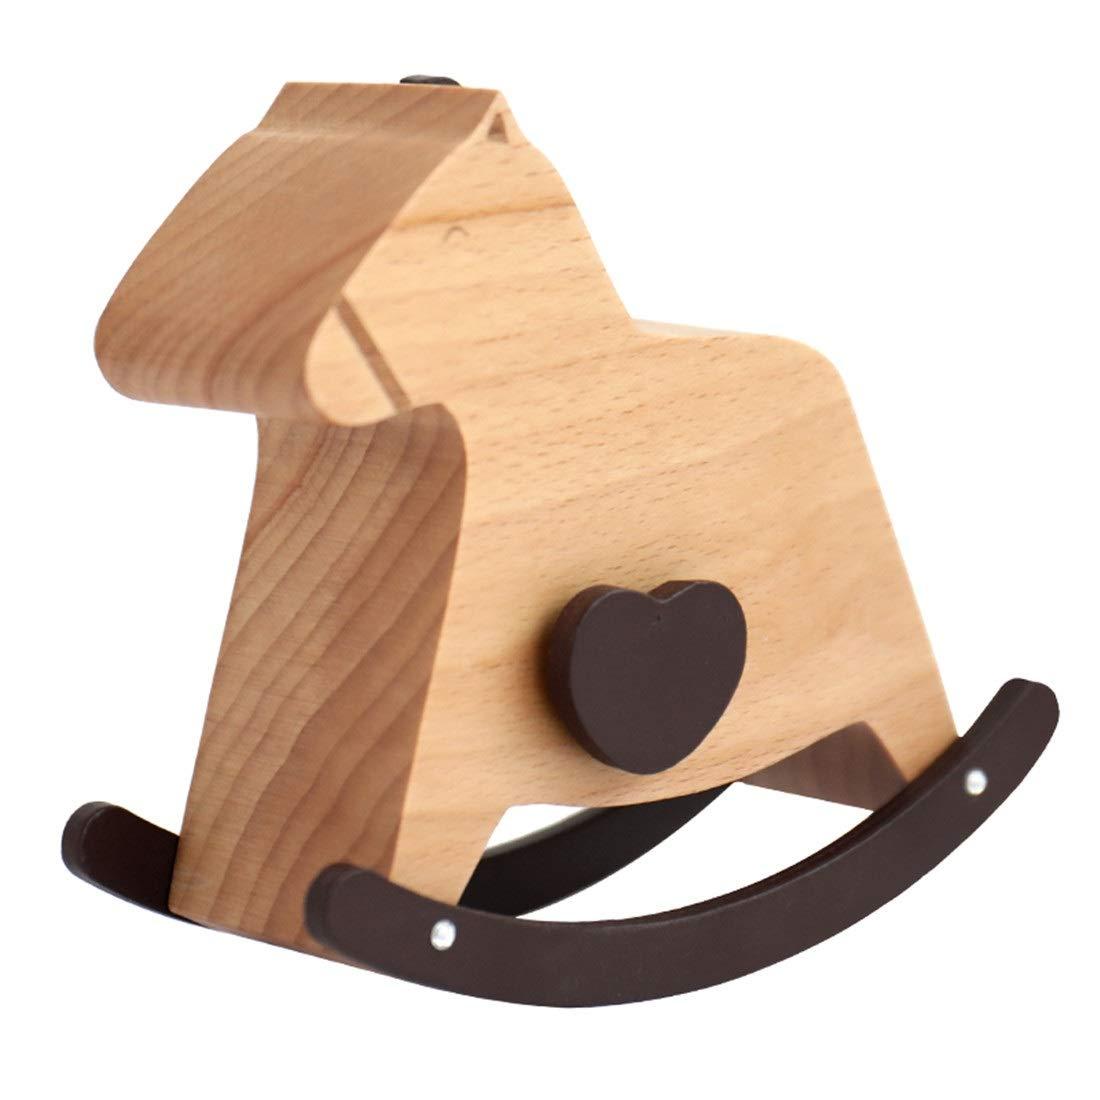 SHENYUAN-Cajas de música Creative Wooden Pony Music Box ...